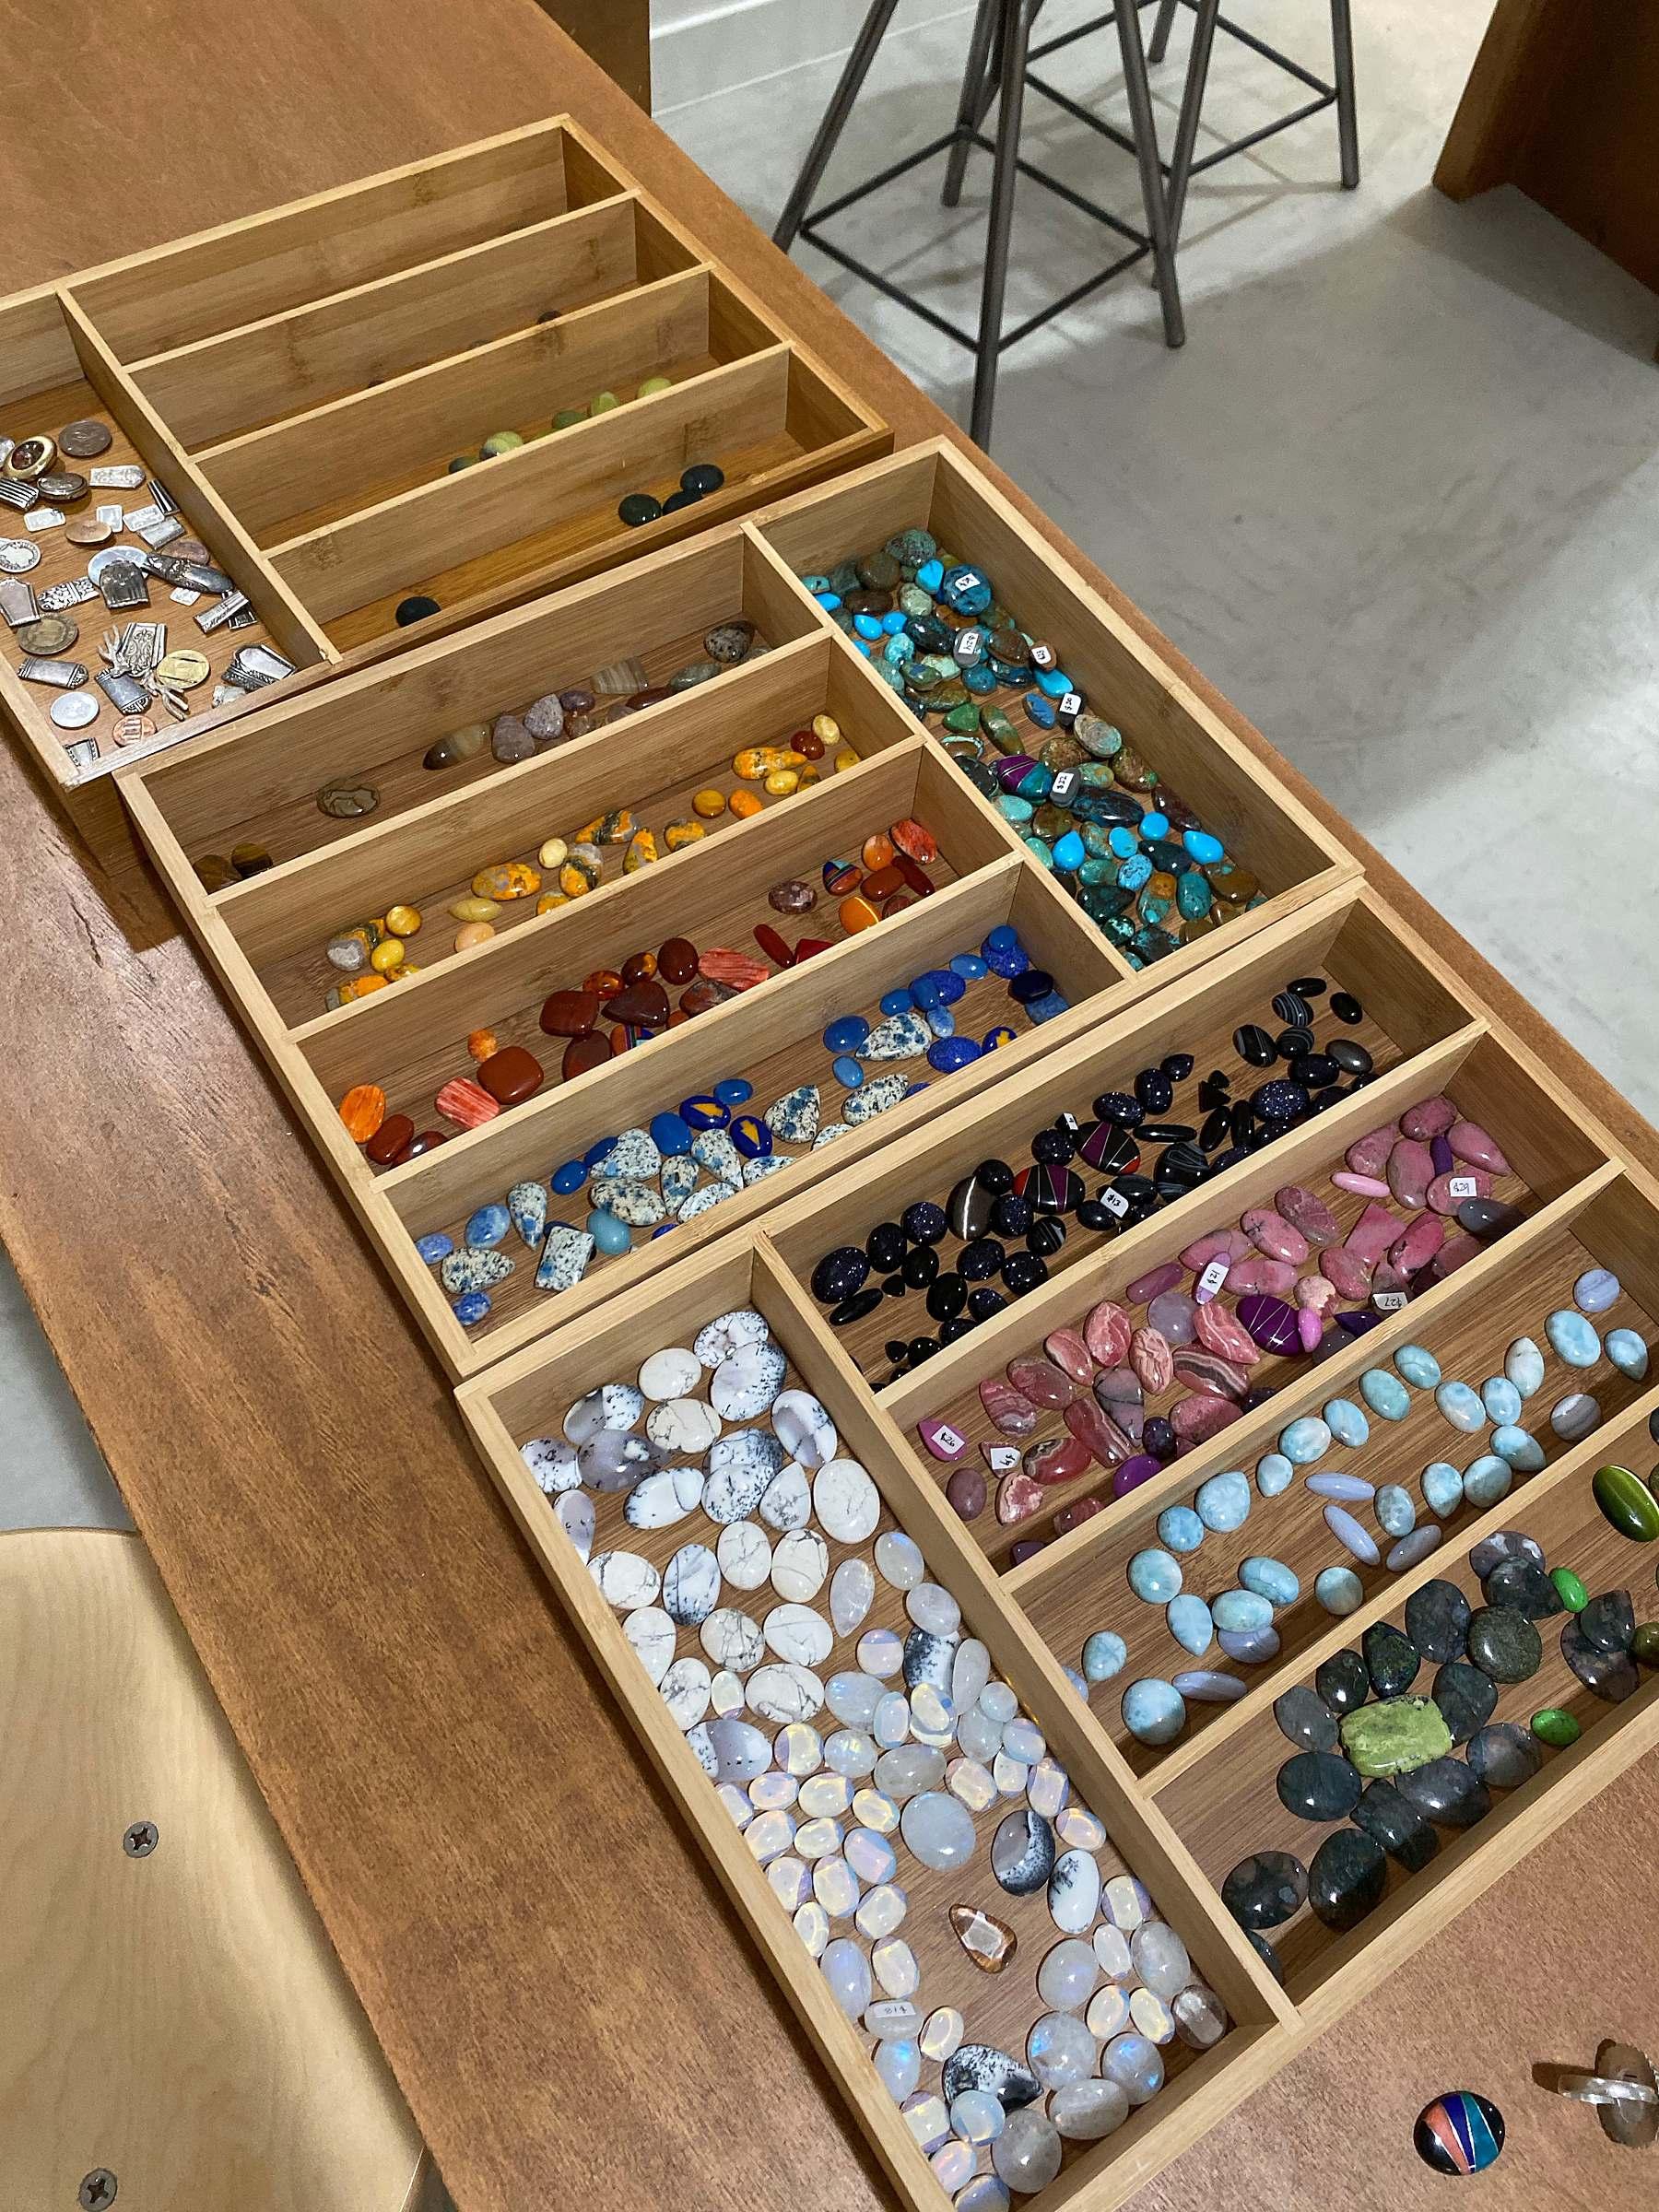 evora jewelry co in Gilbert make your own ring for a fun girls night in phoenix arizona area